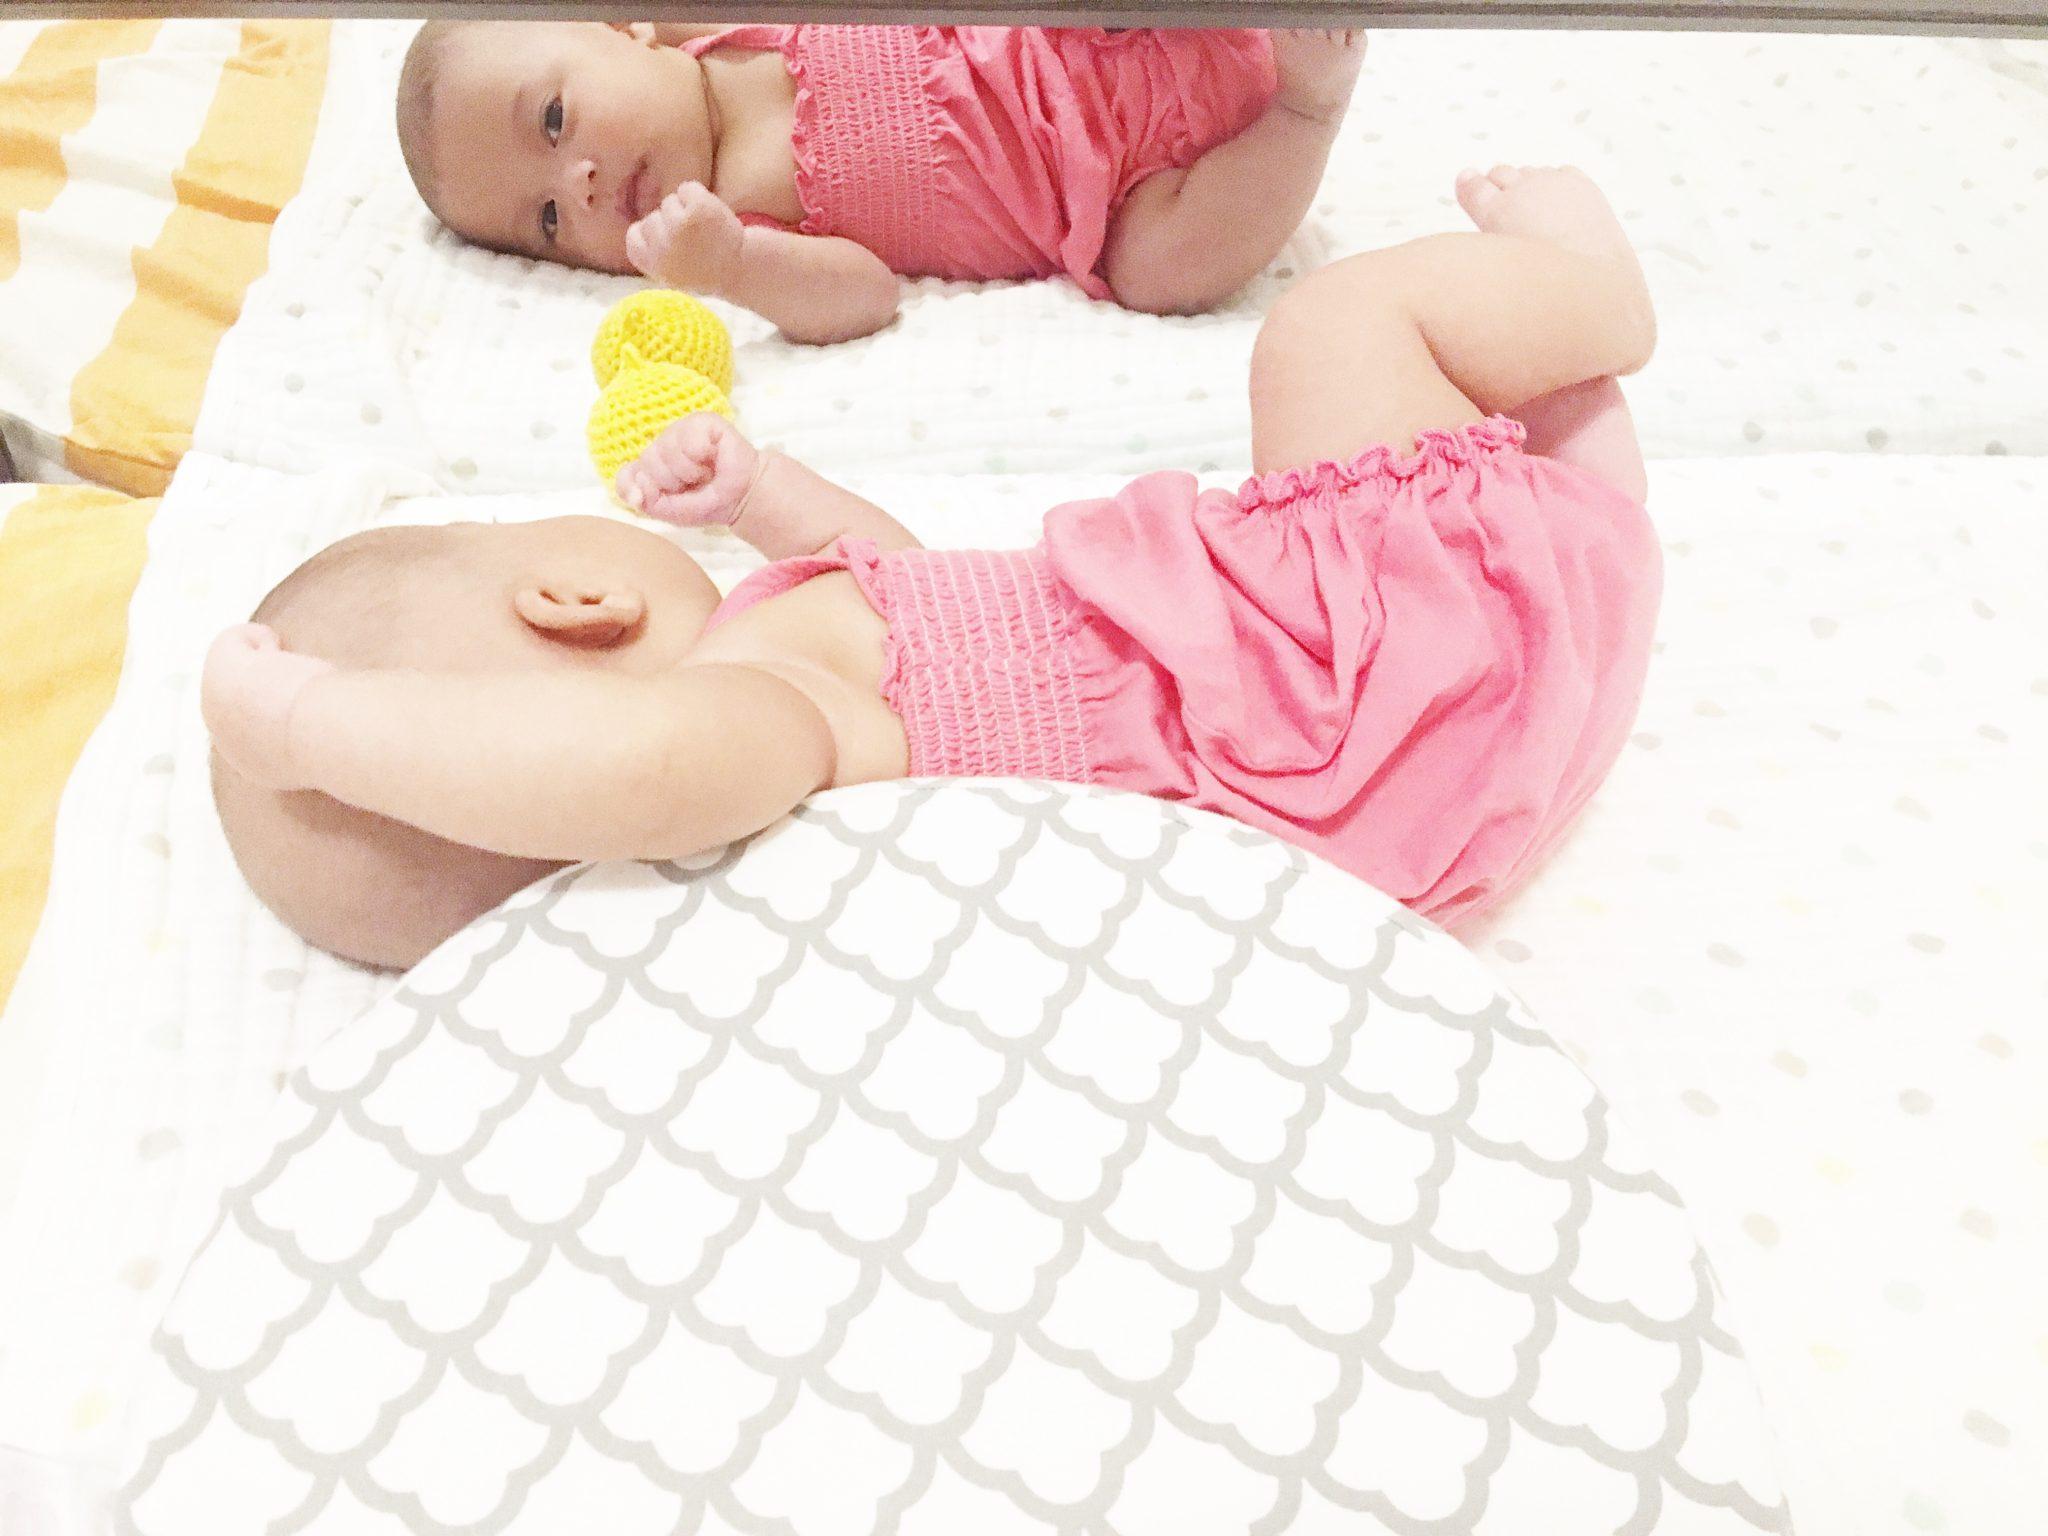 Stimulasi ala Montessori dan Perkembangan Bayi 2 Bulan